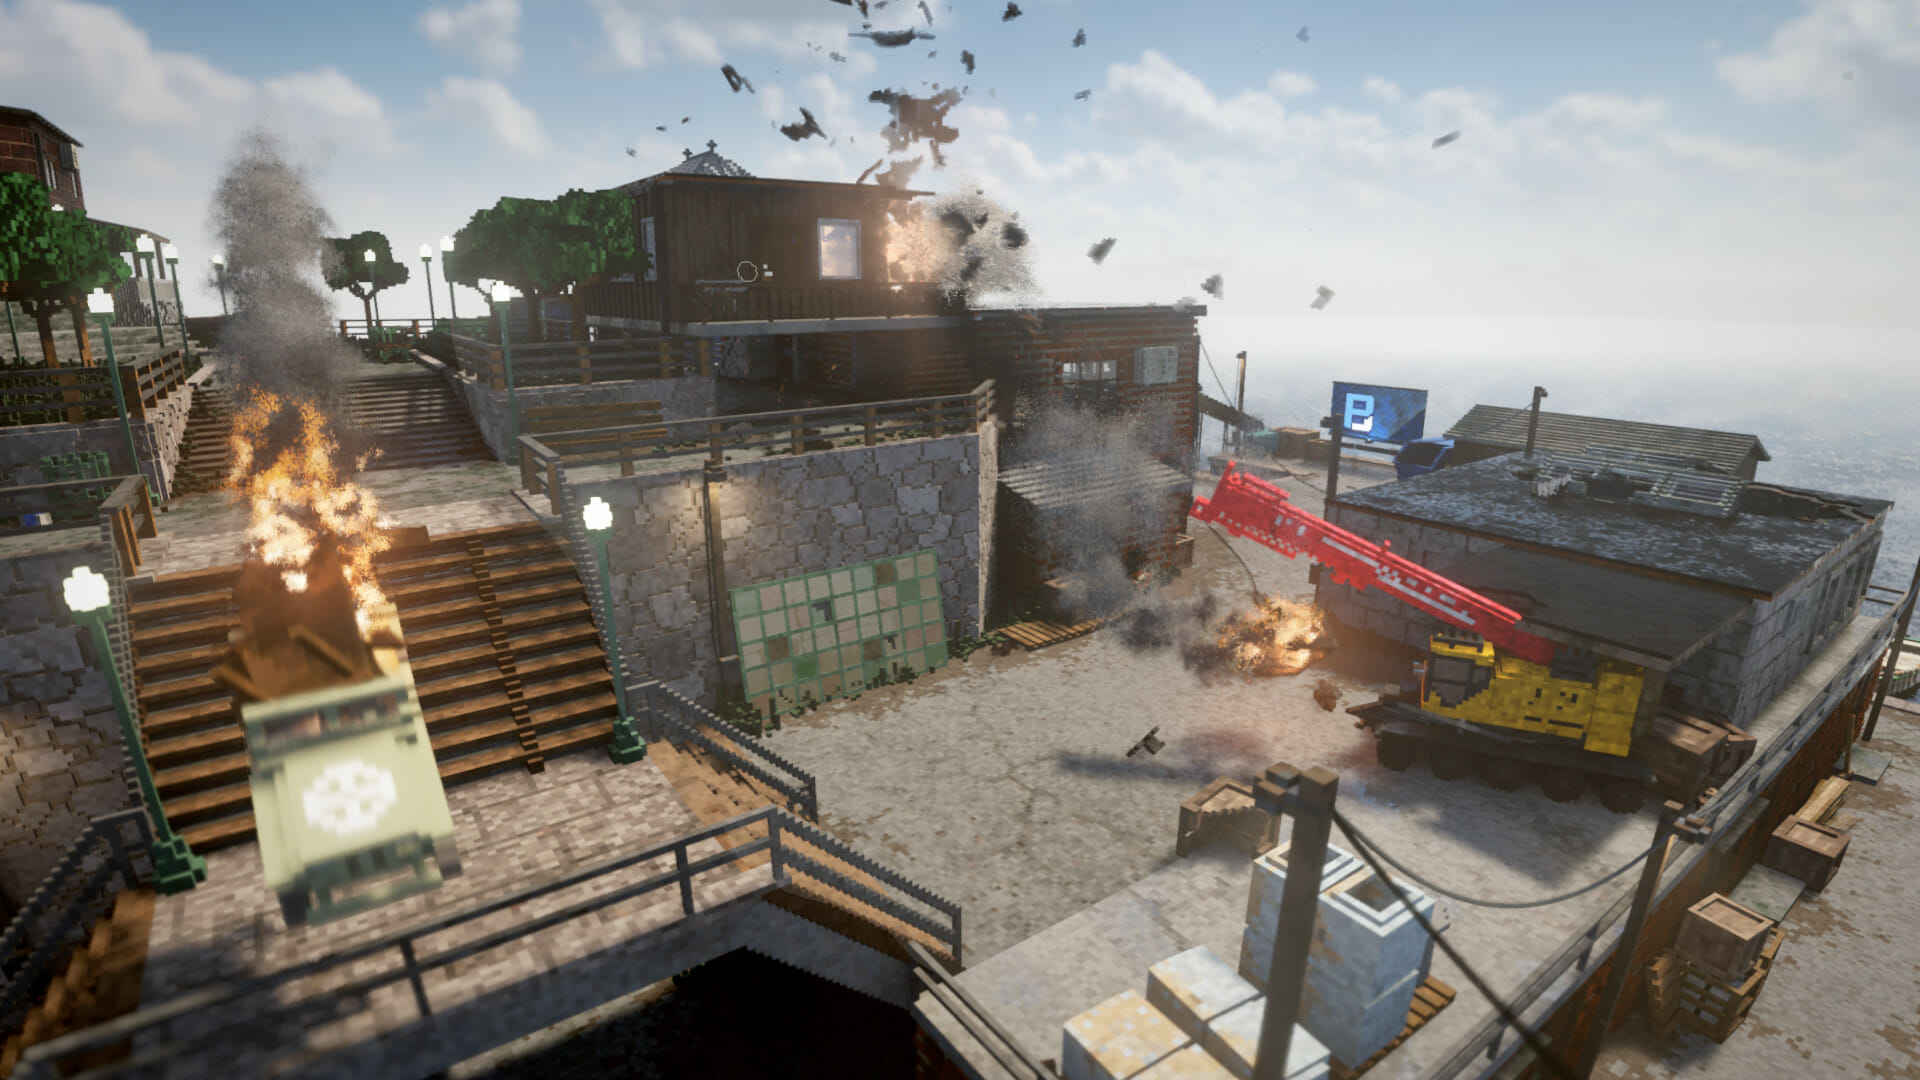 Teardown Crash during save